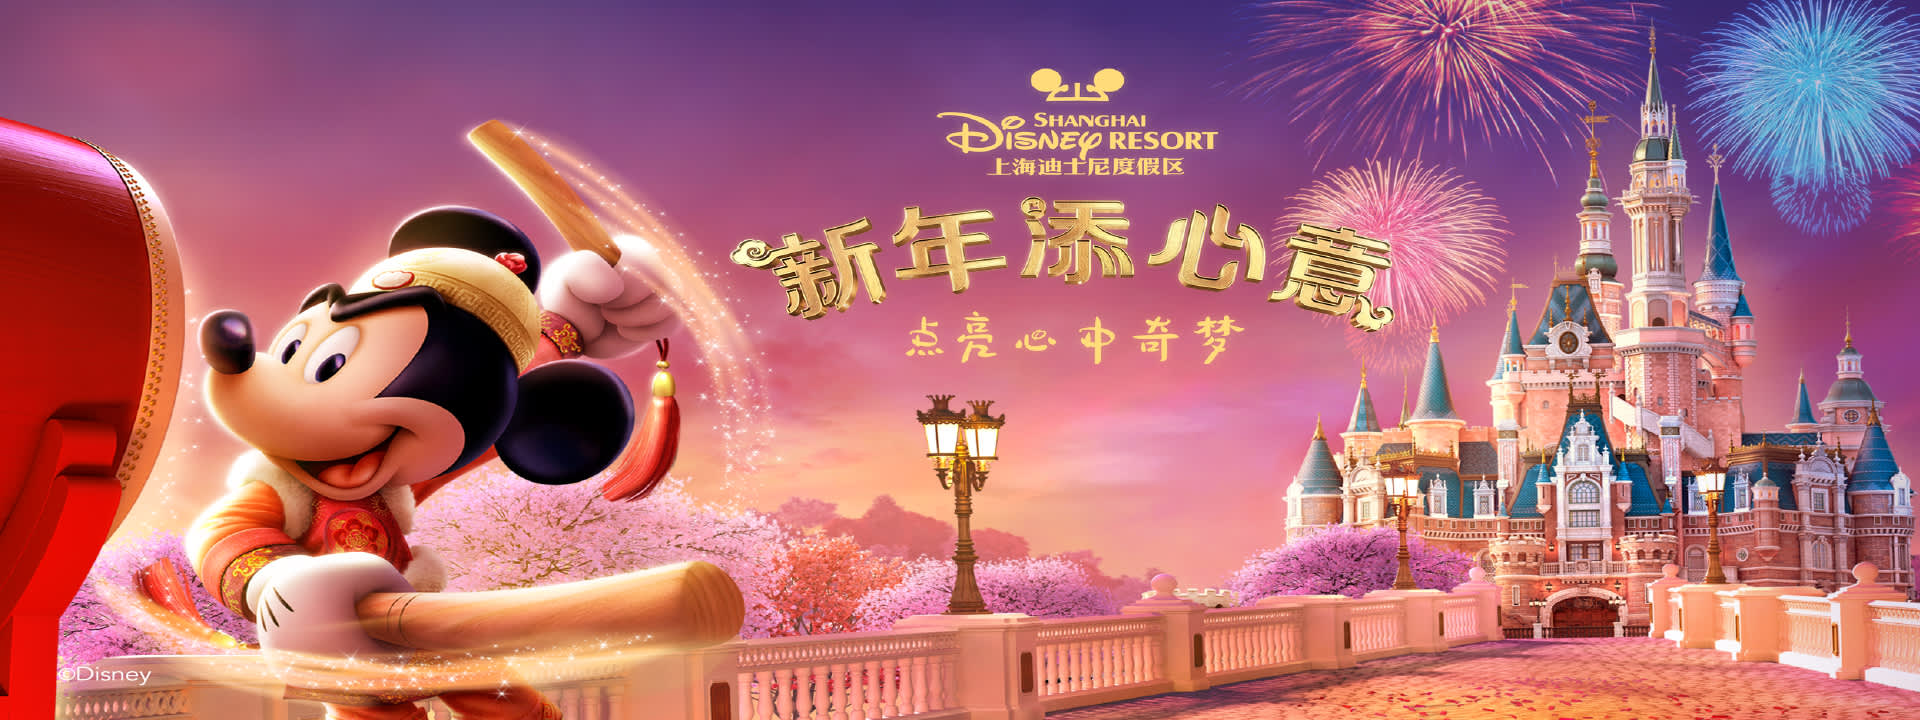 Shanghai Disneyland (2 Day Admission) - Klook